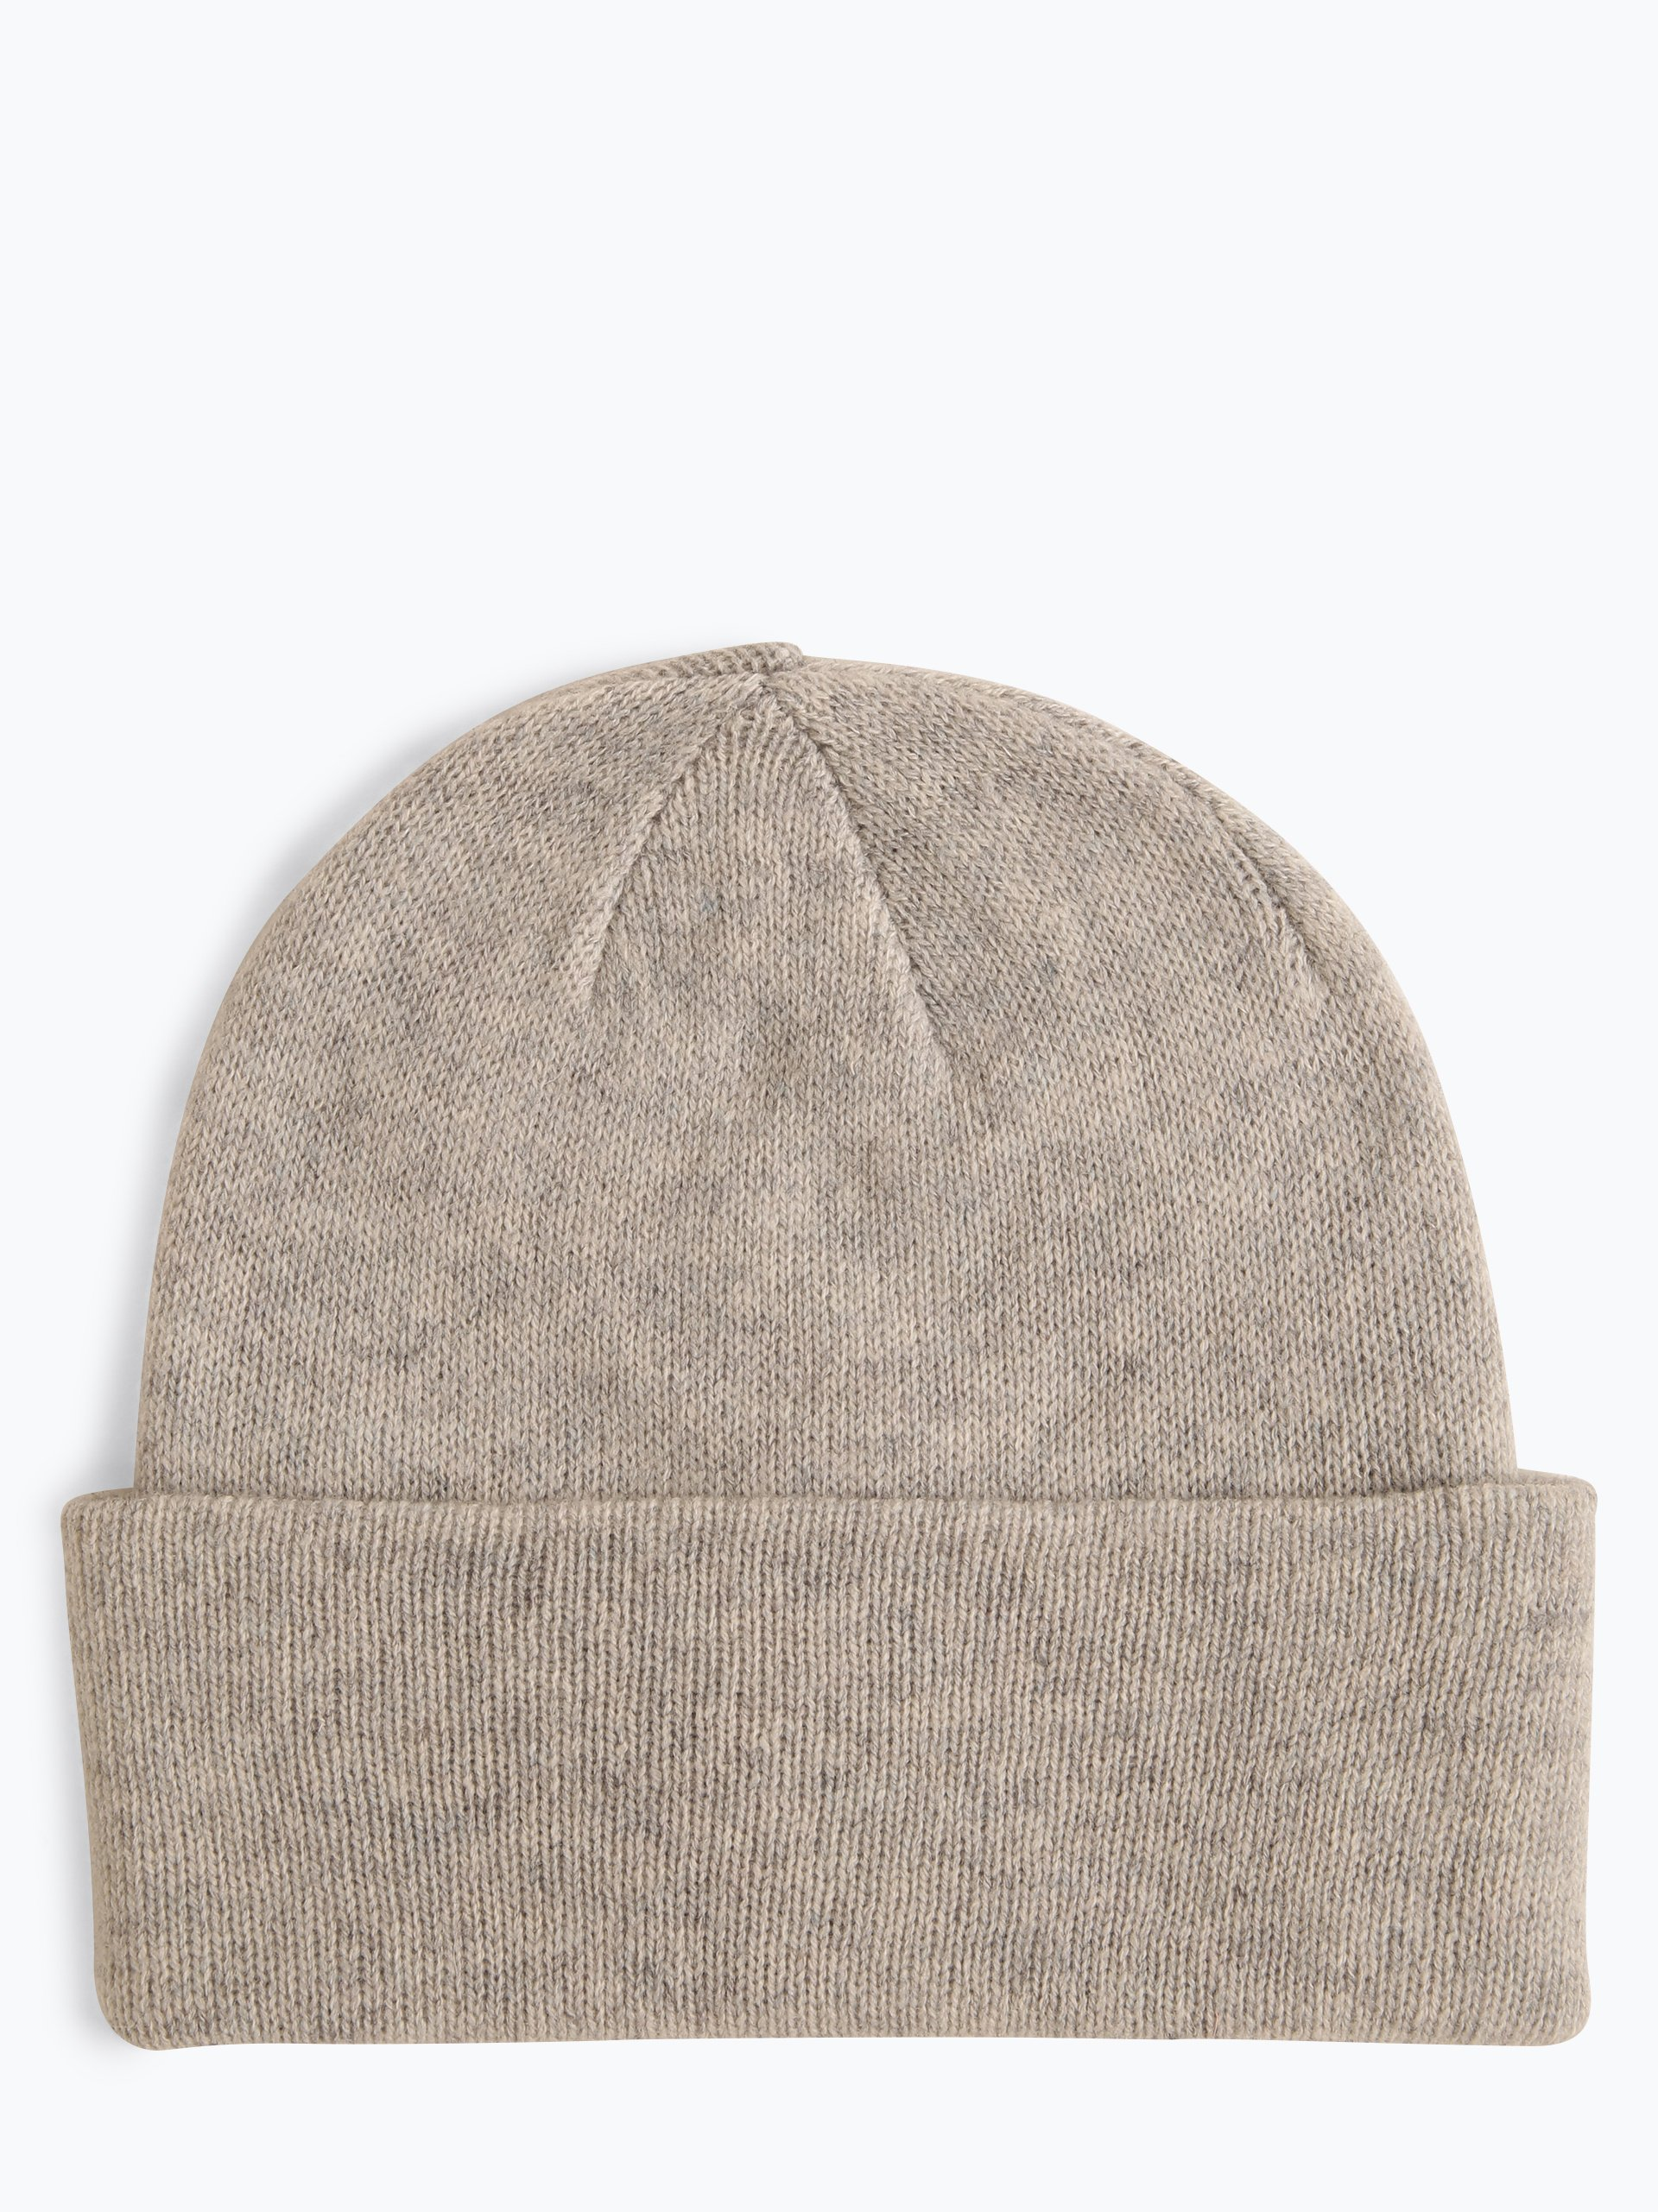 Opus Damen Mütze - Abada